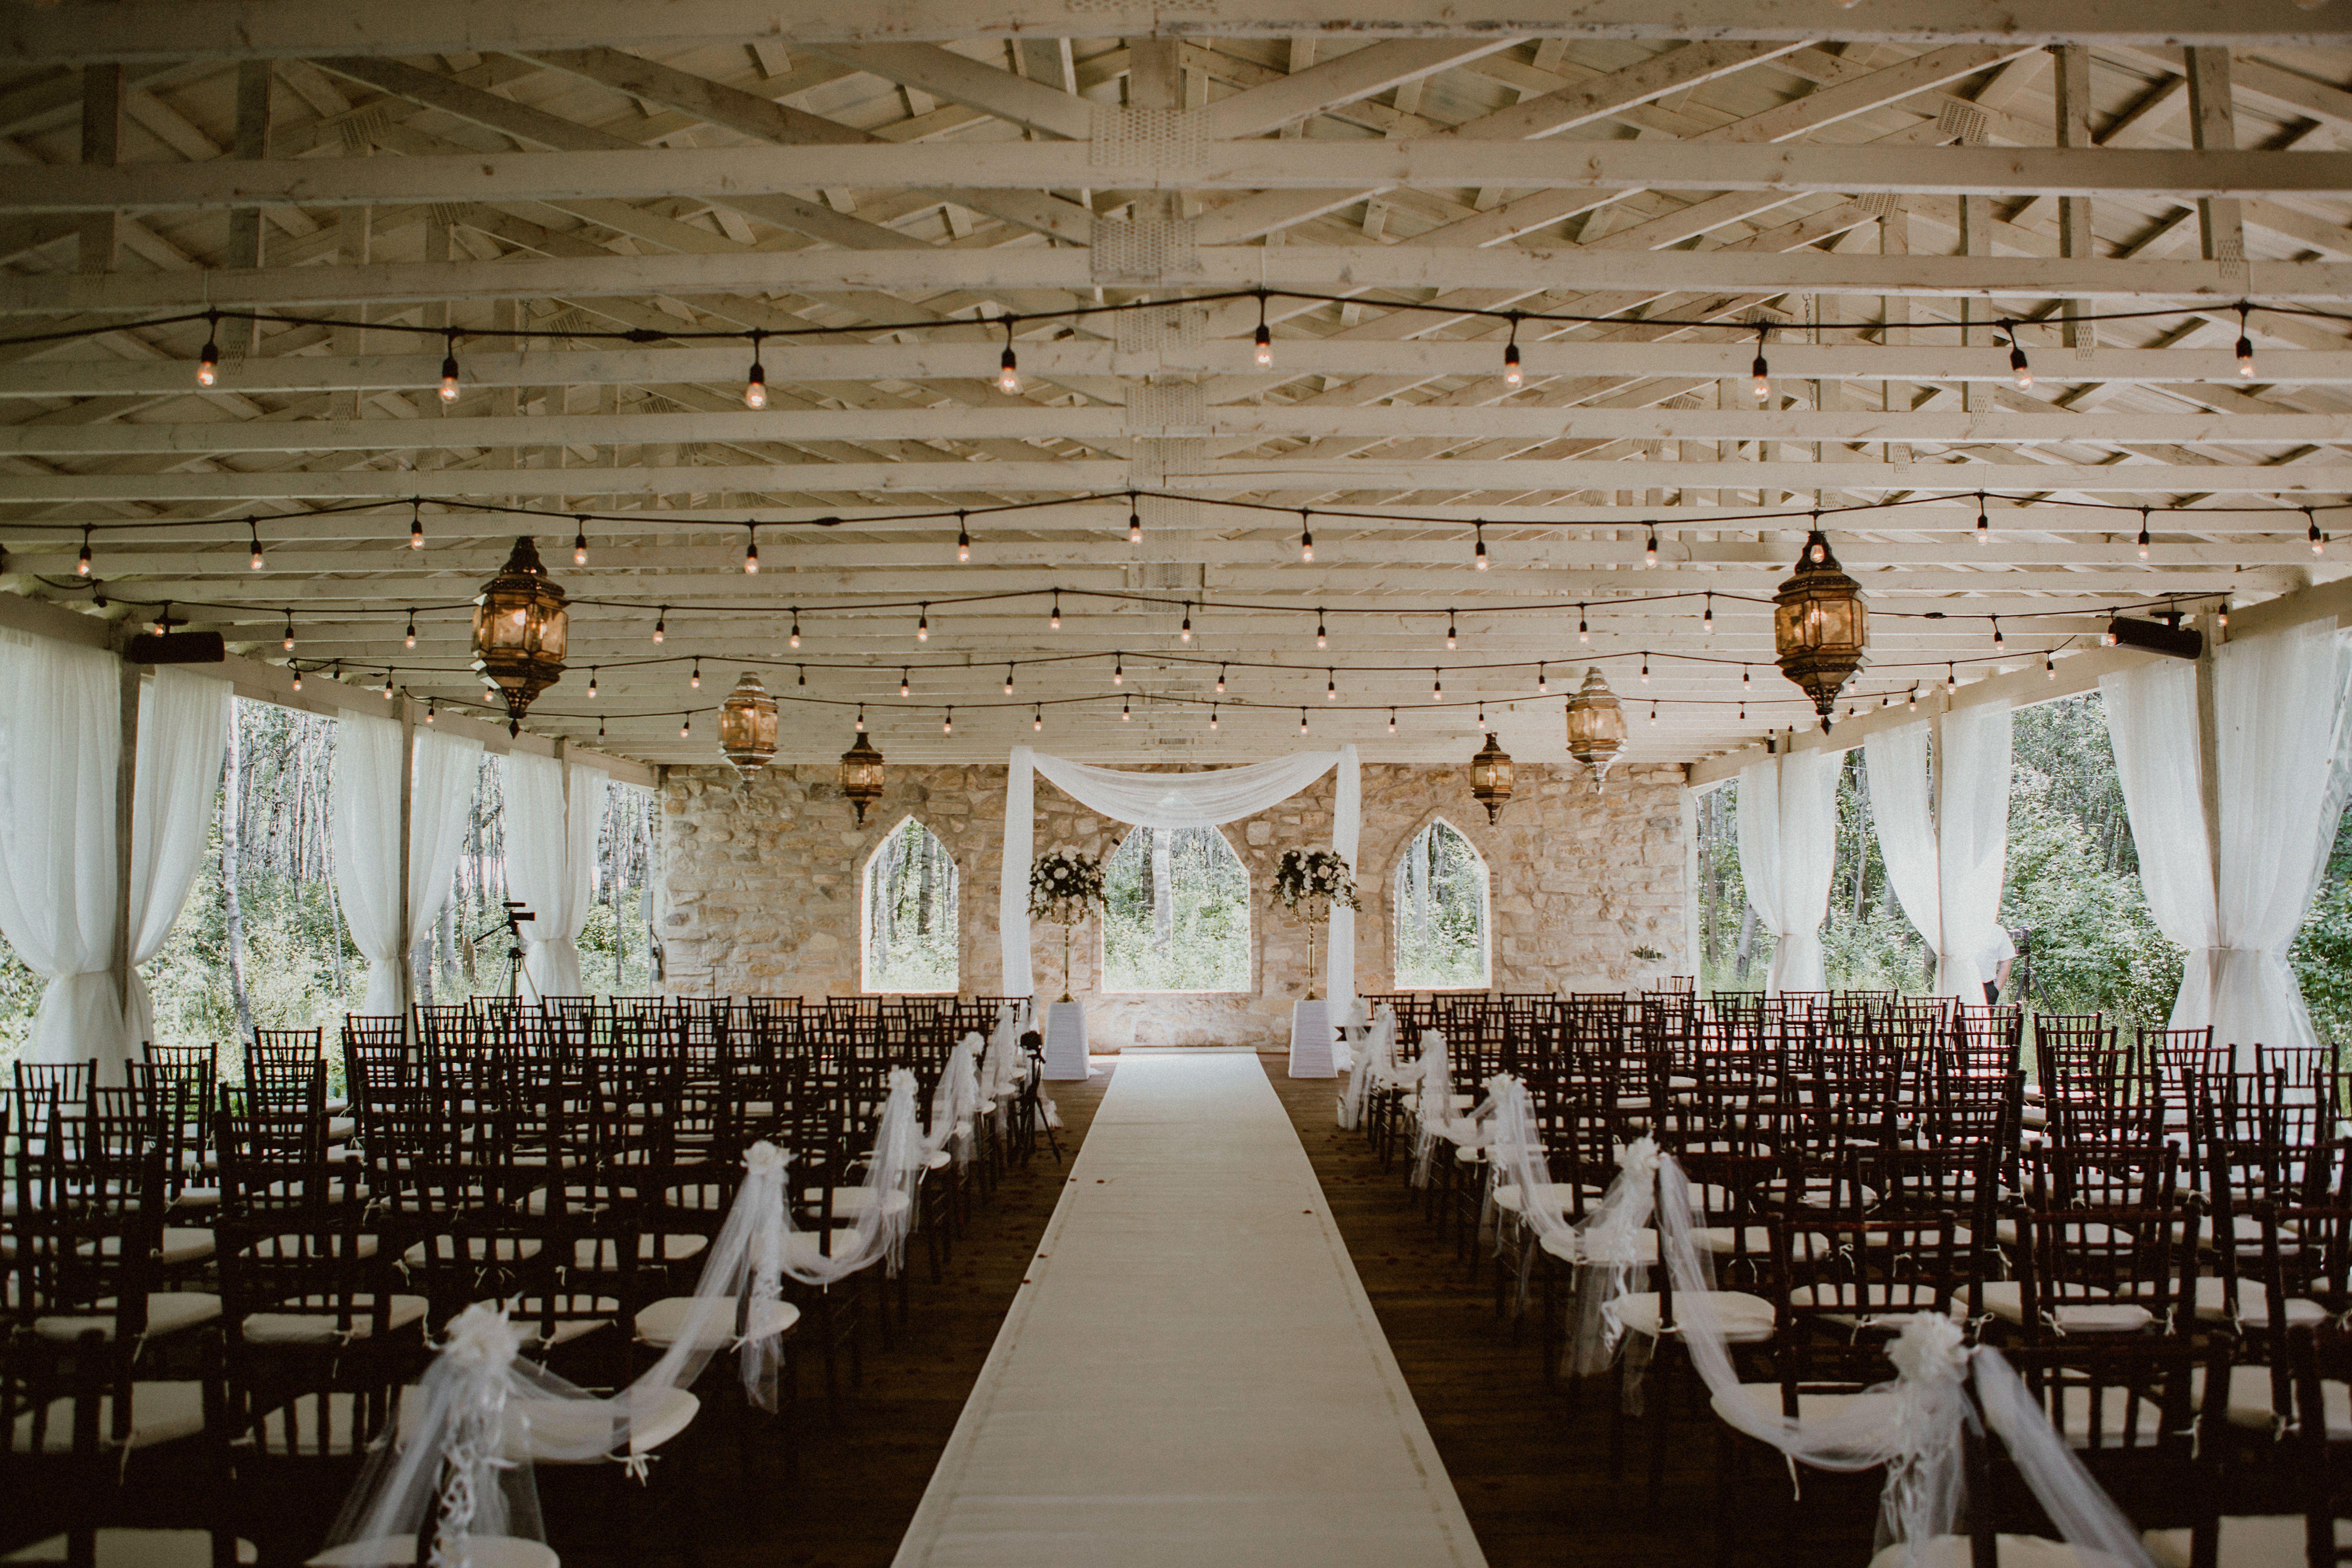 Cielo S Garden Winnipeg Wedding Venue Wedding Venues Cheap Wedding Venues Downtown Wedding Venues